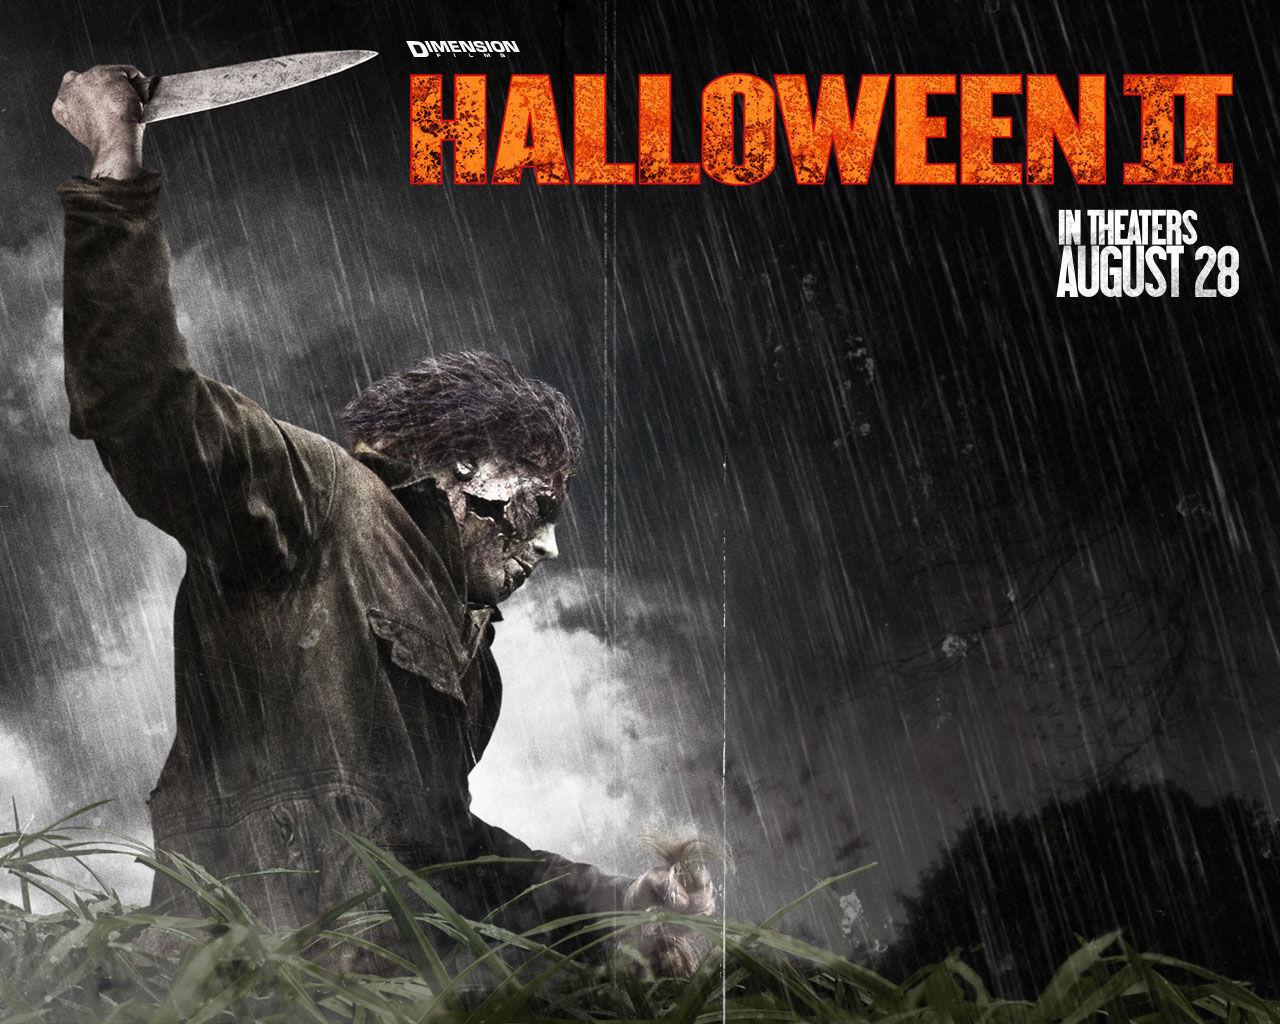 Halloween 2 2009 wallpapers Horror Movies Wallpaper 8028032 1280x1024